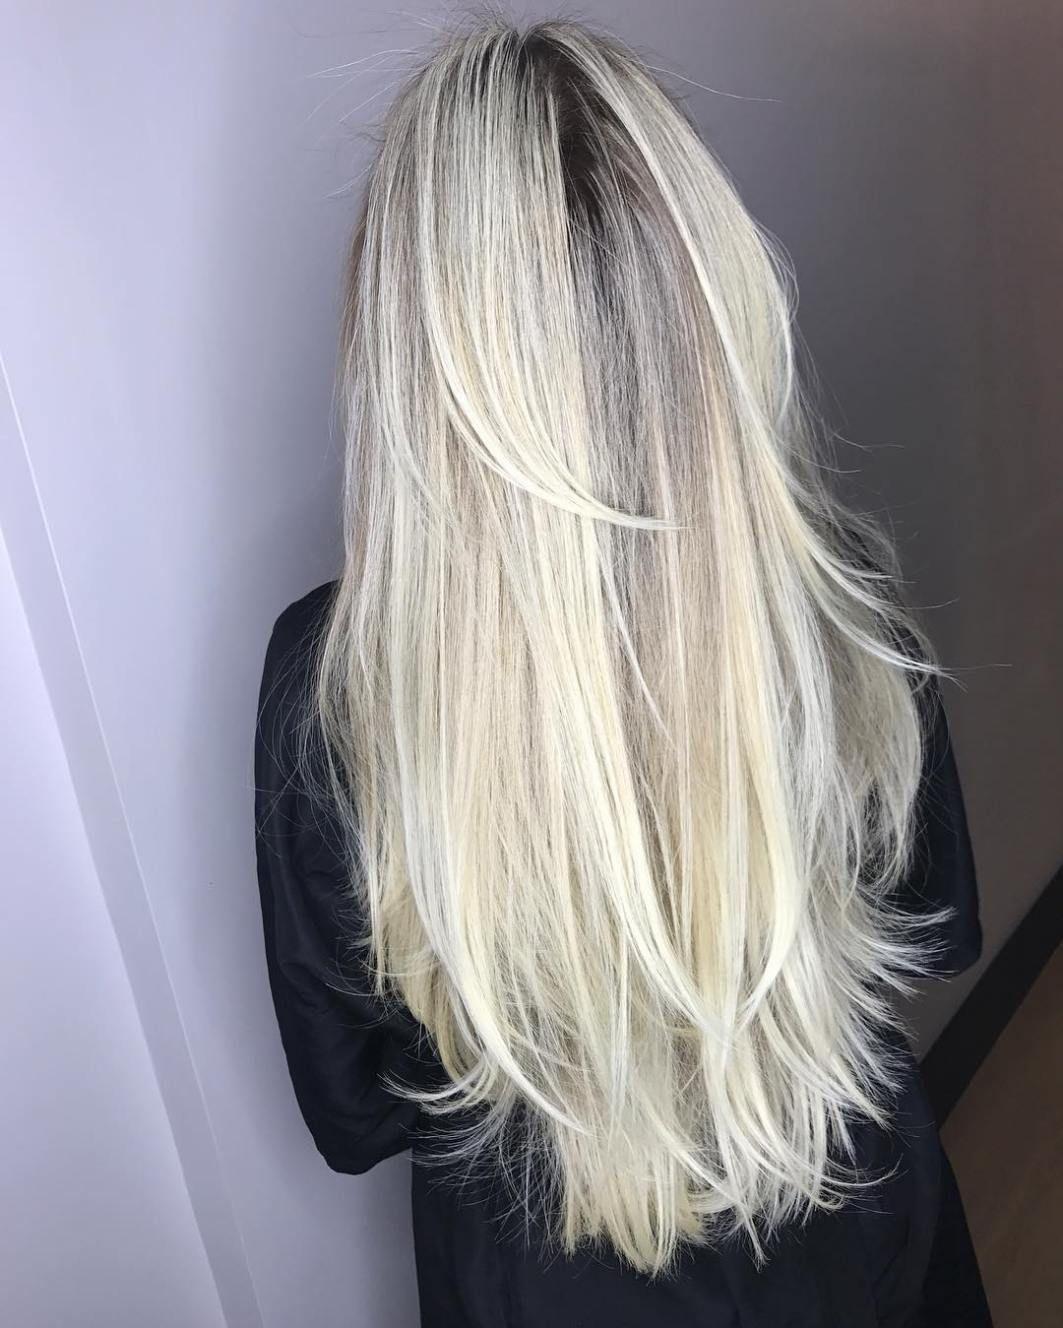 cute layered hairstyles and cuts for long hair long hai